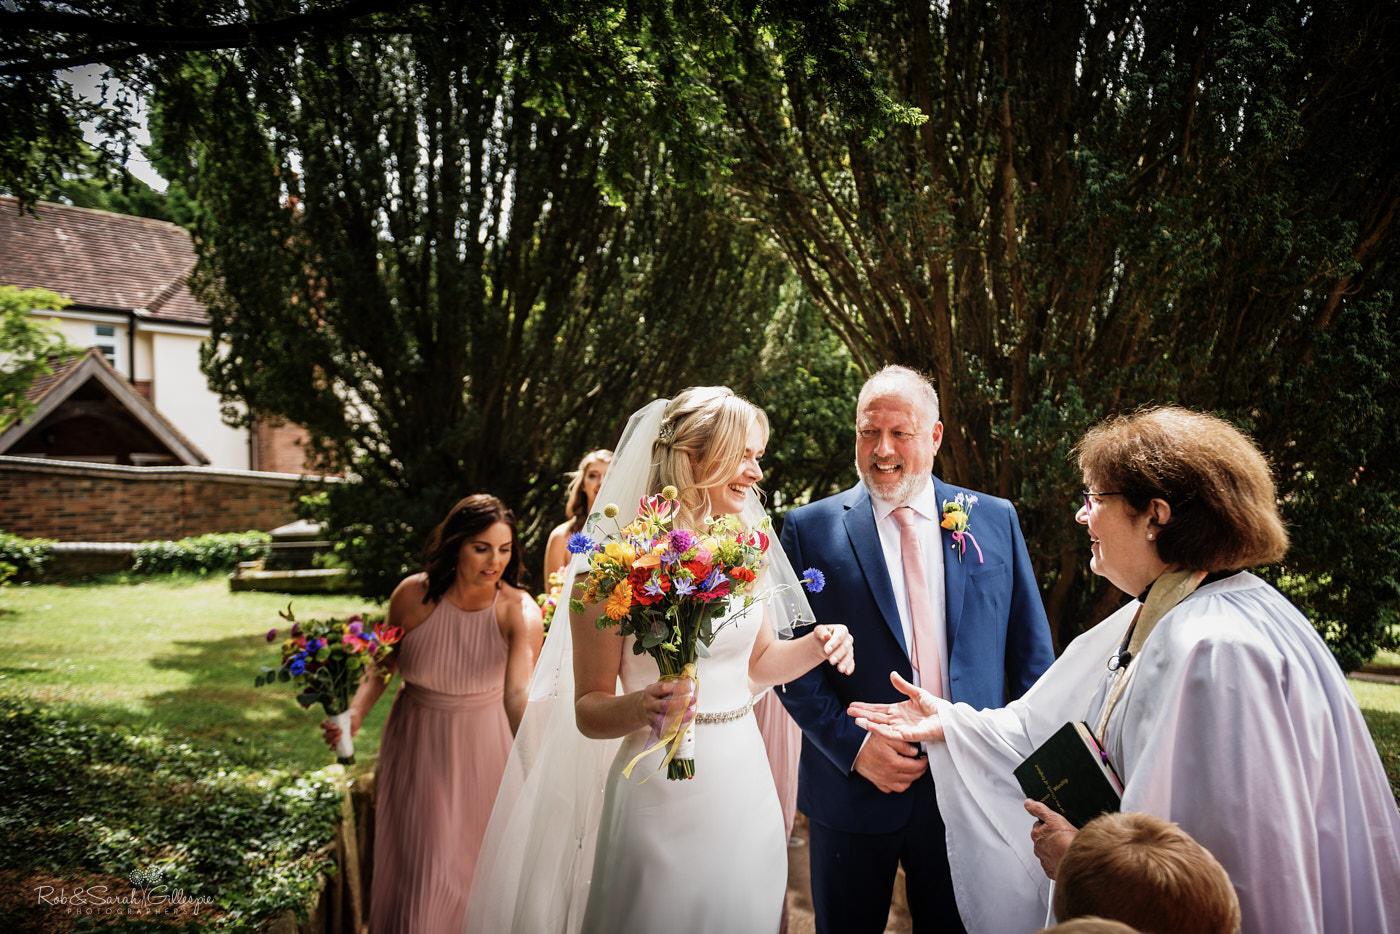 Vicar greets bride as she arrives for wedding at church